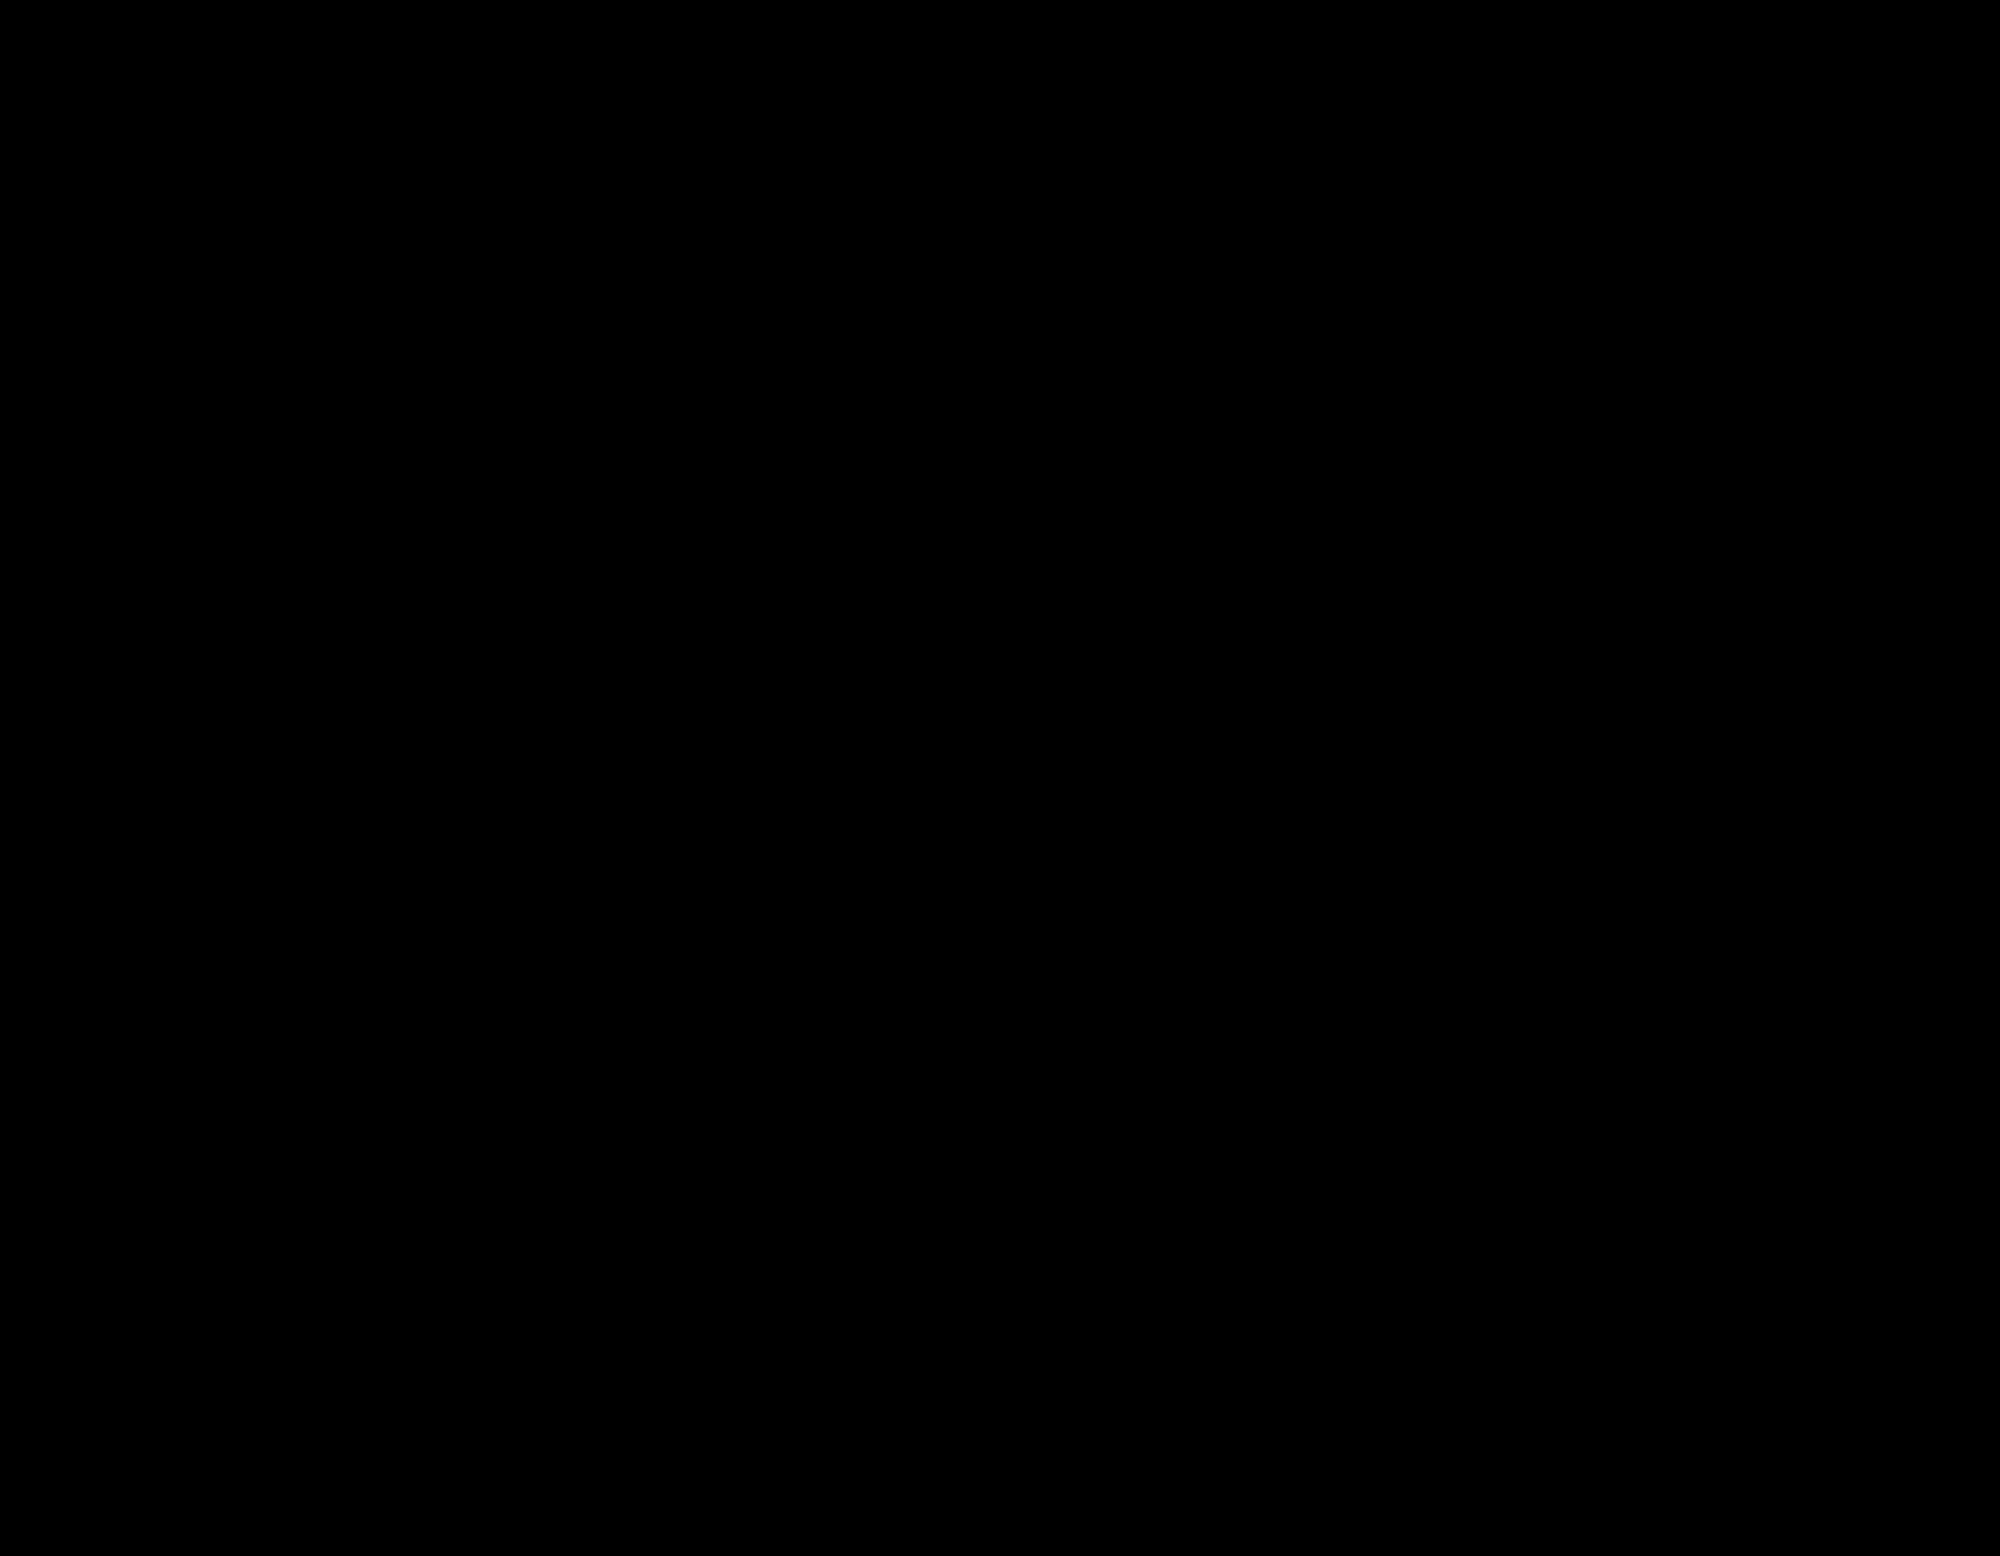 ABA's logo on its website:americanbar.org